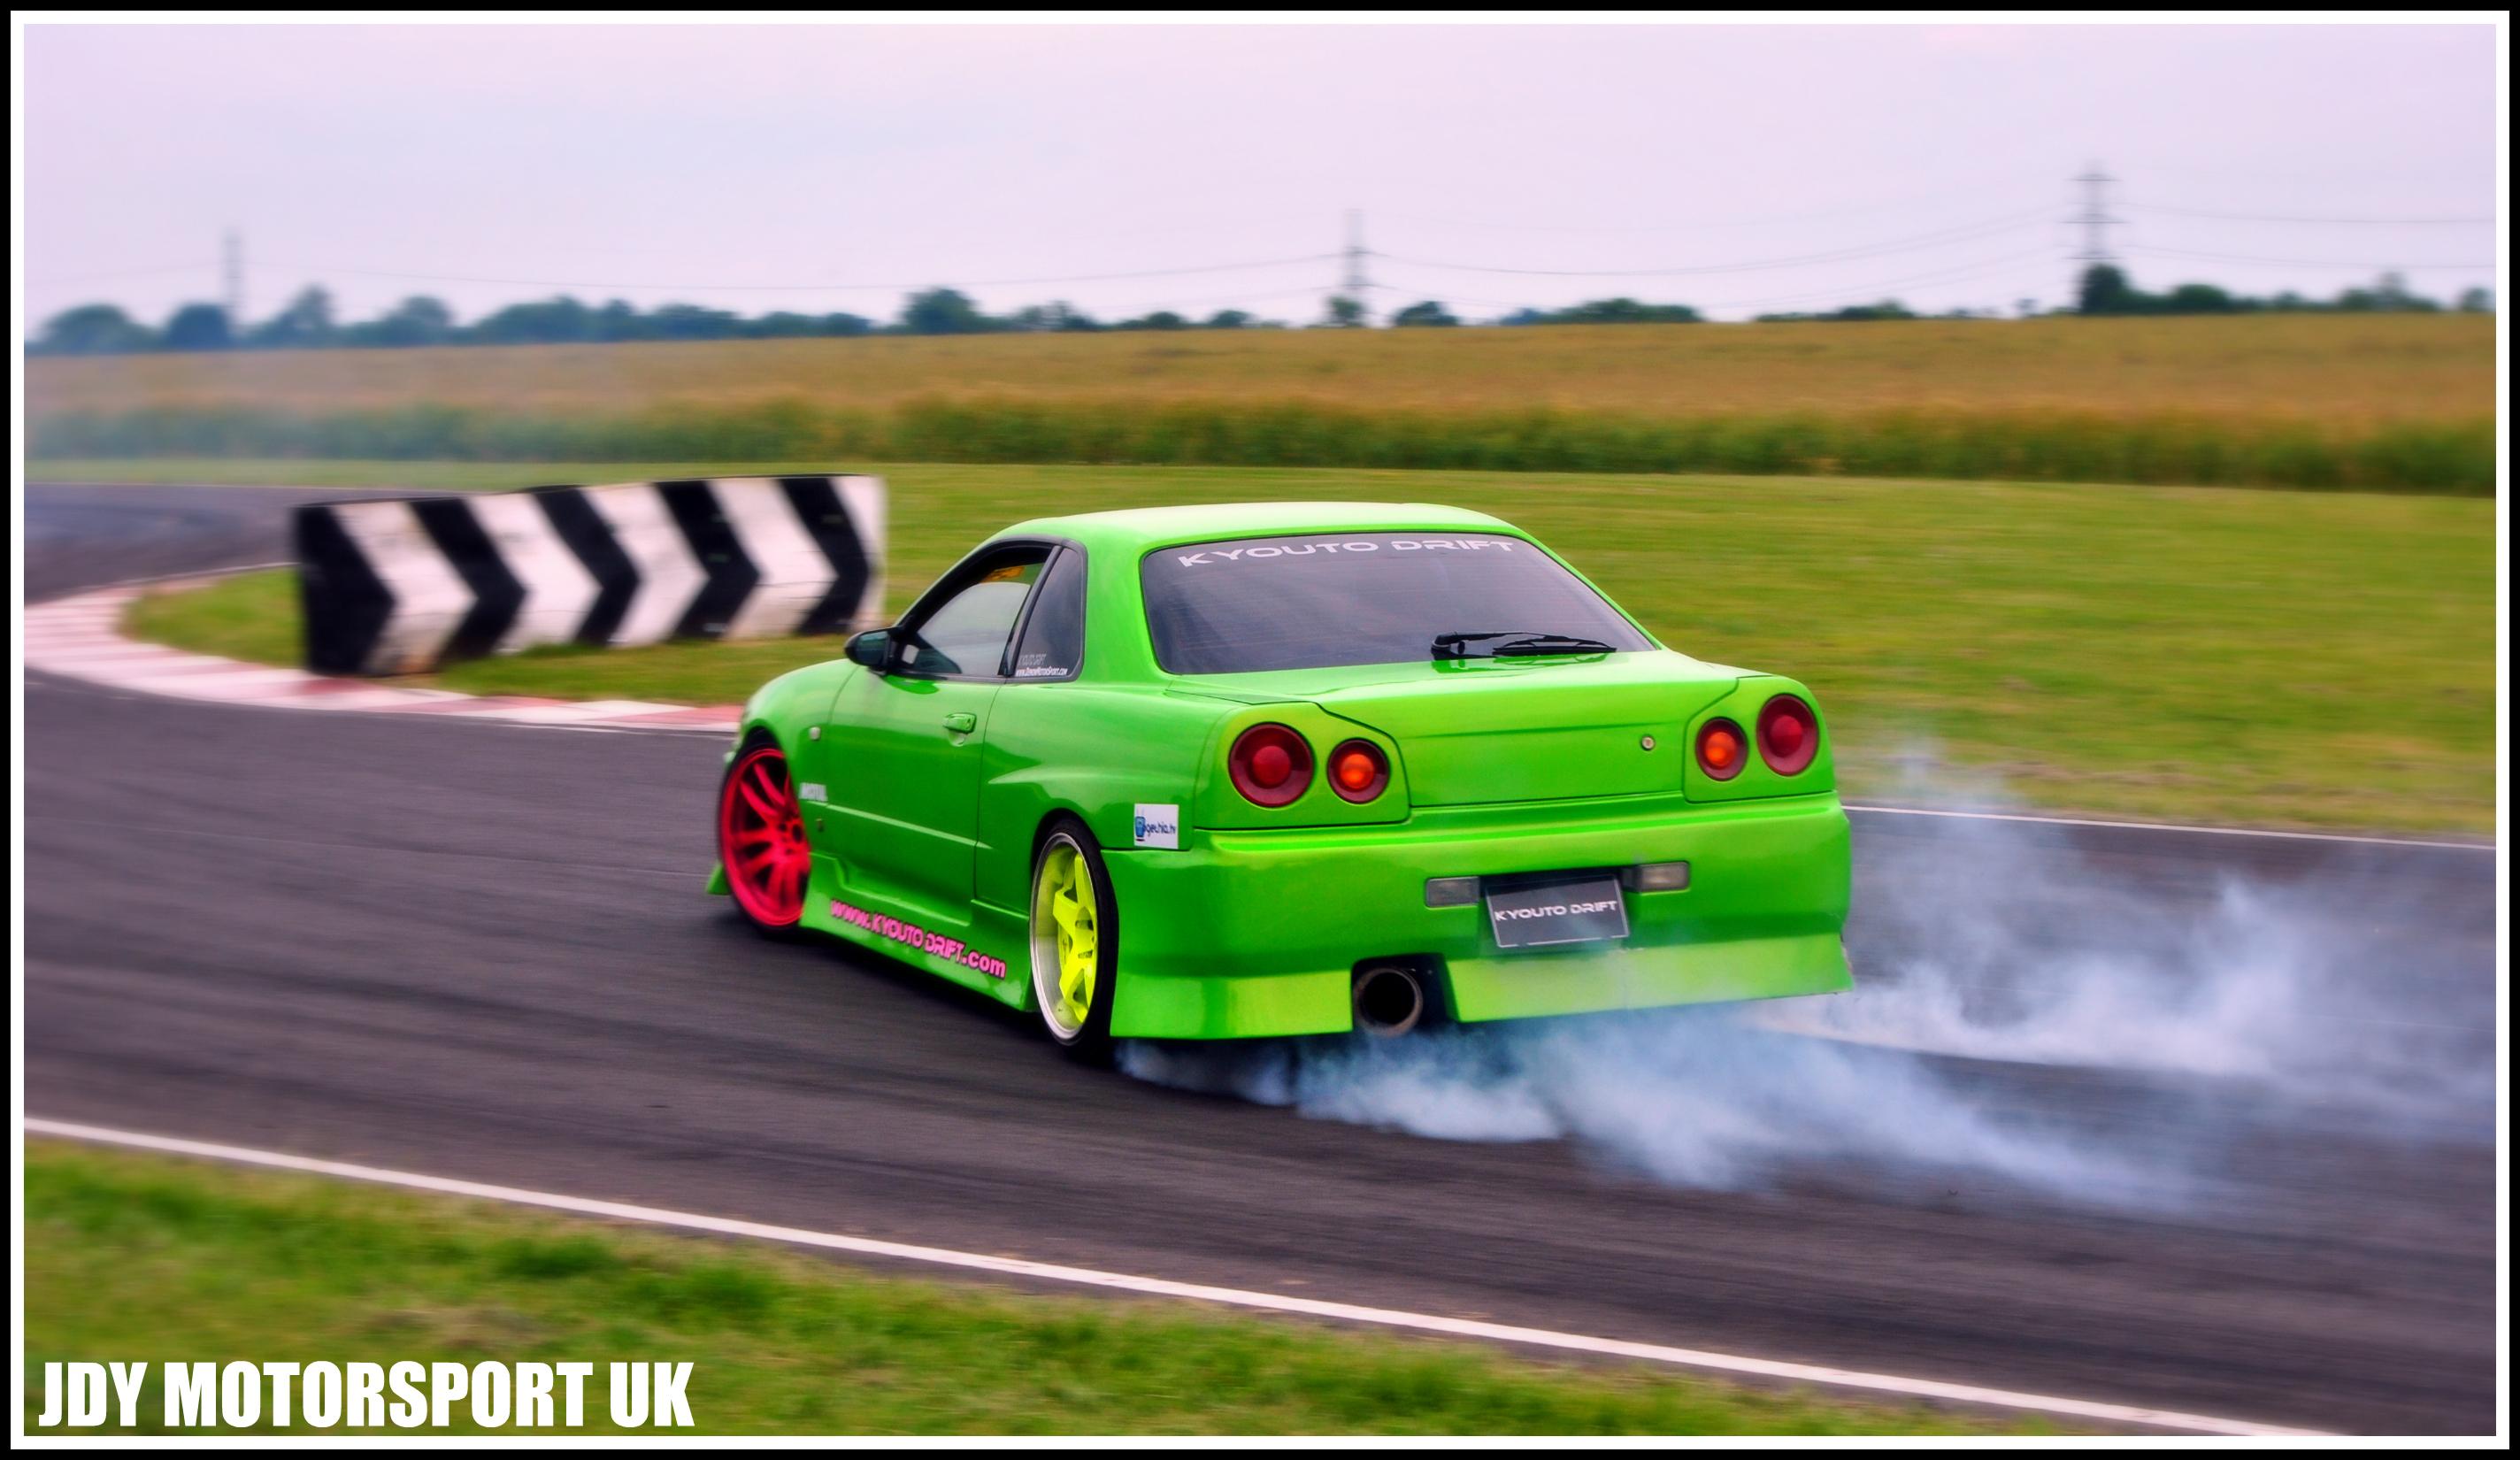 Alex Manning Kyouto Drift R34 Jdy Motorsport Com